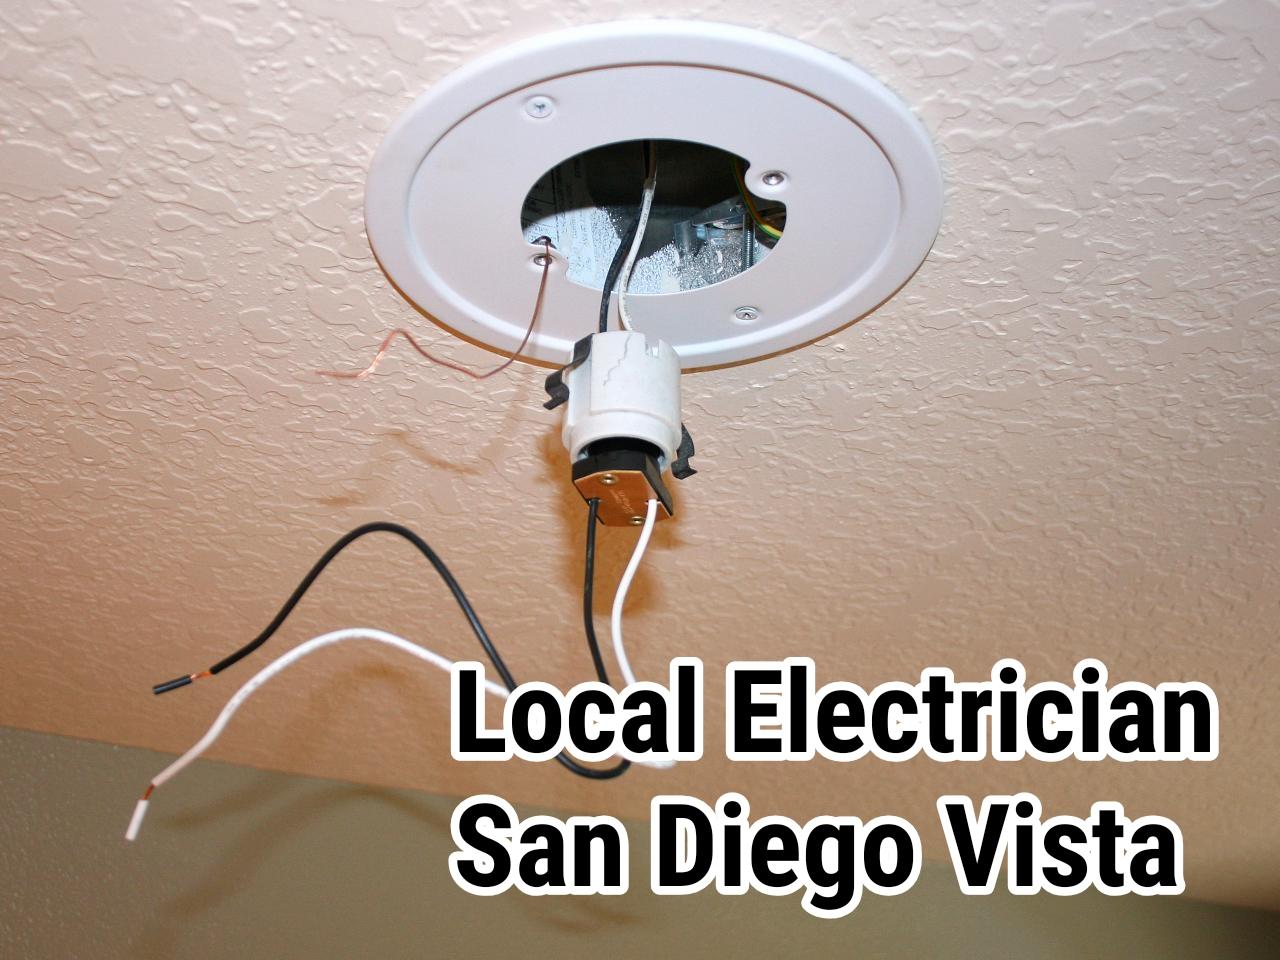 Local Electrician San Diego Vista